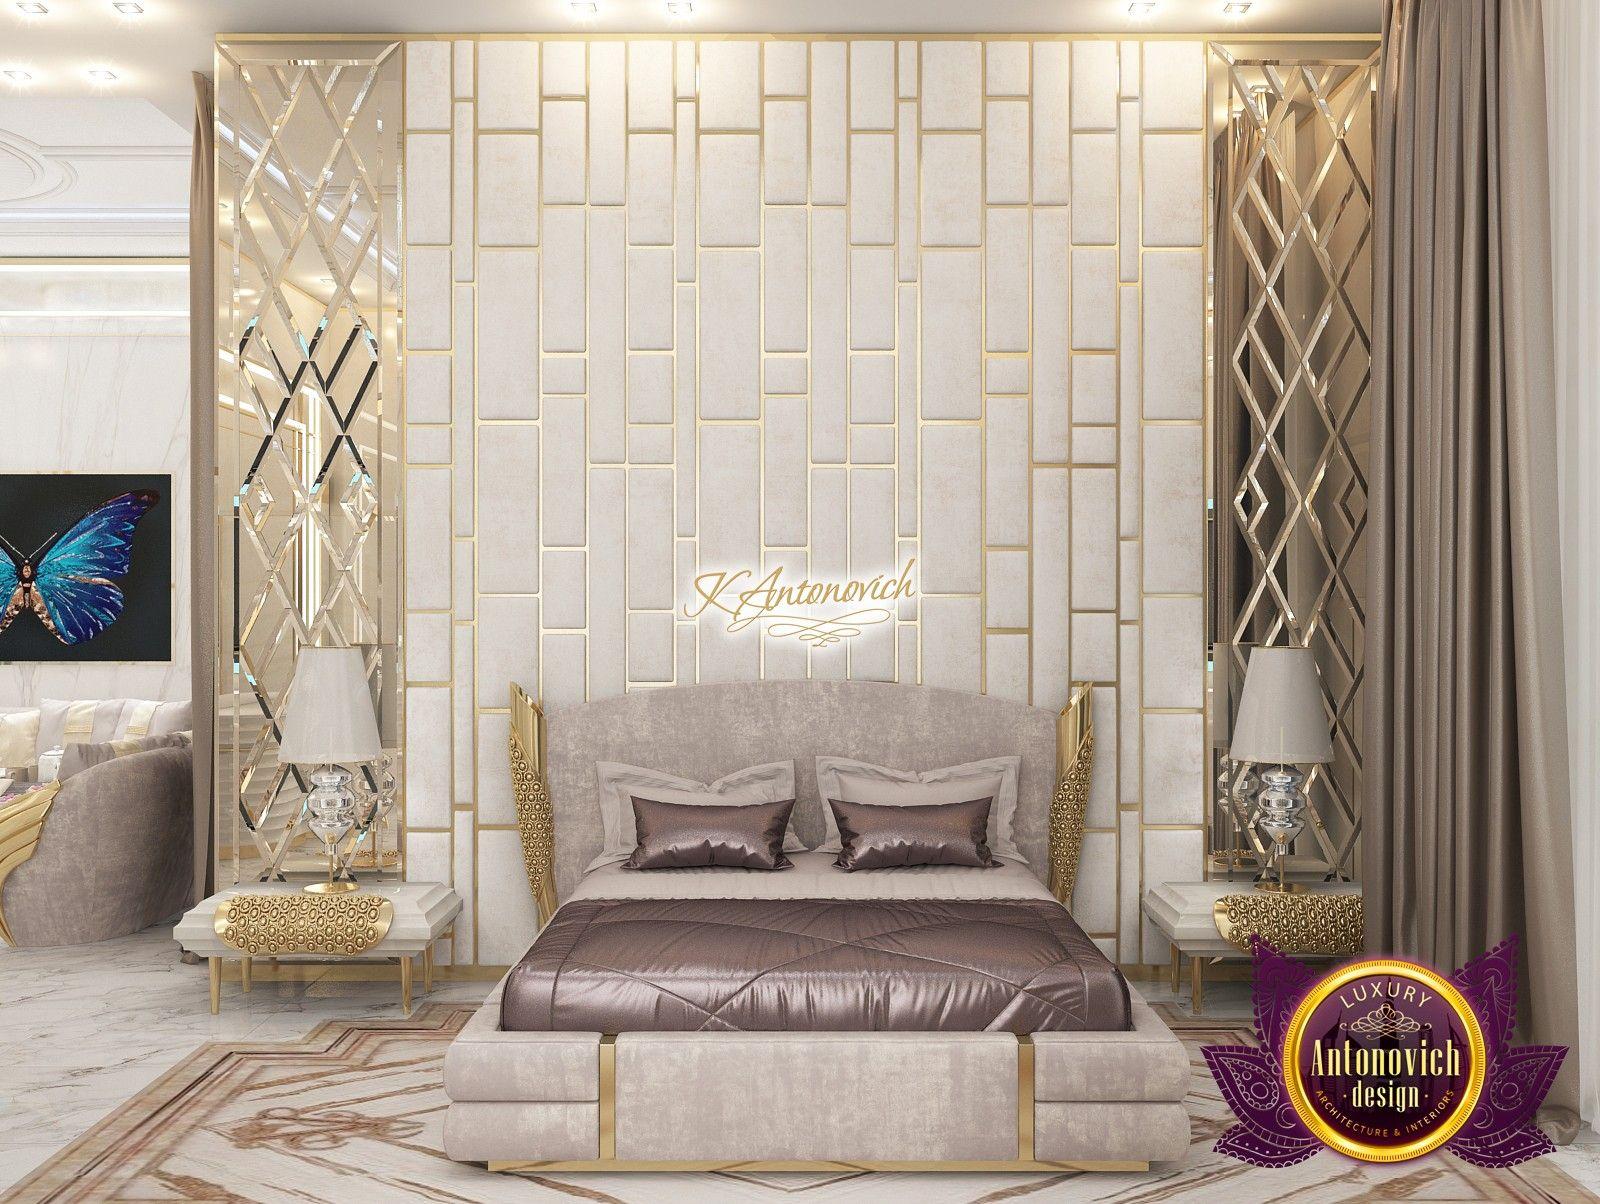 Master Bedroom Interior Design In Ghana Favorite Concept Design Of All Ti Bedroom Interior Design Luxury Master Bedroom Interior Design Elegant Bedroom Design